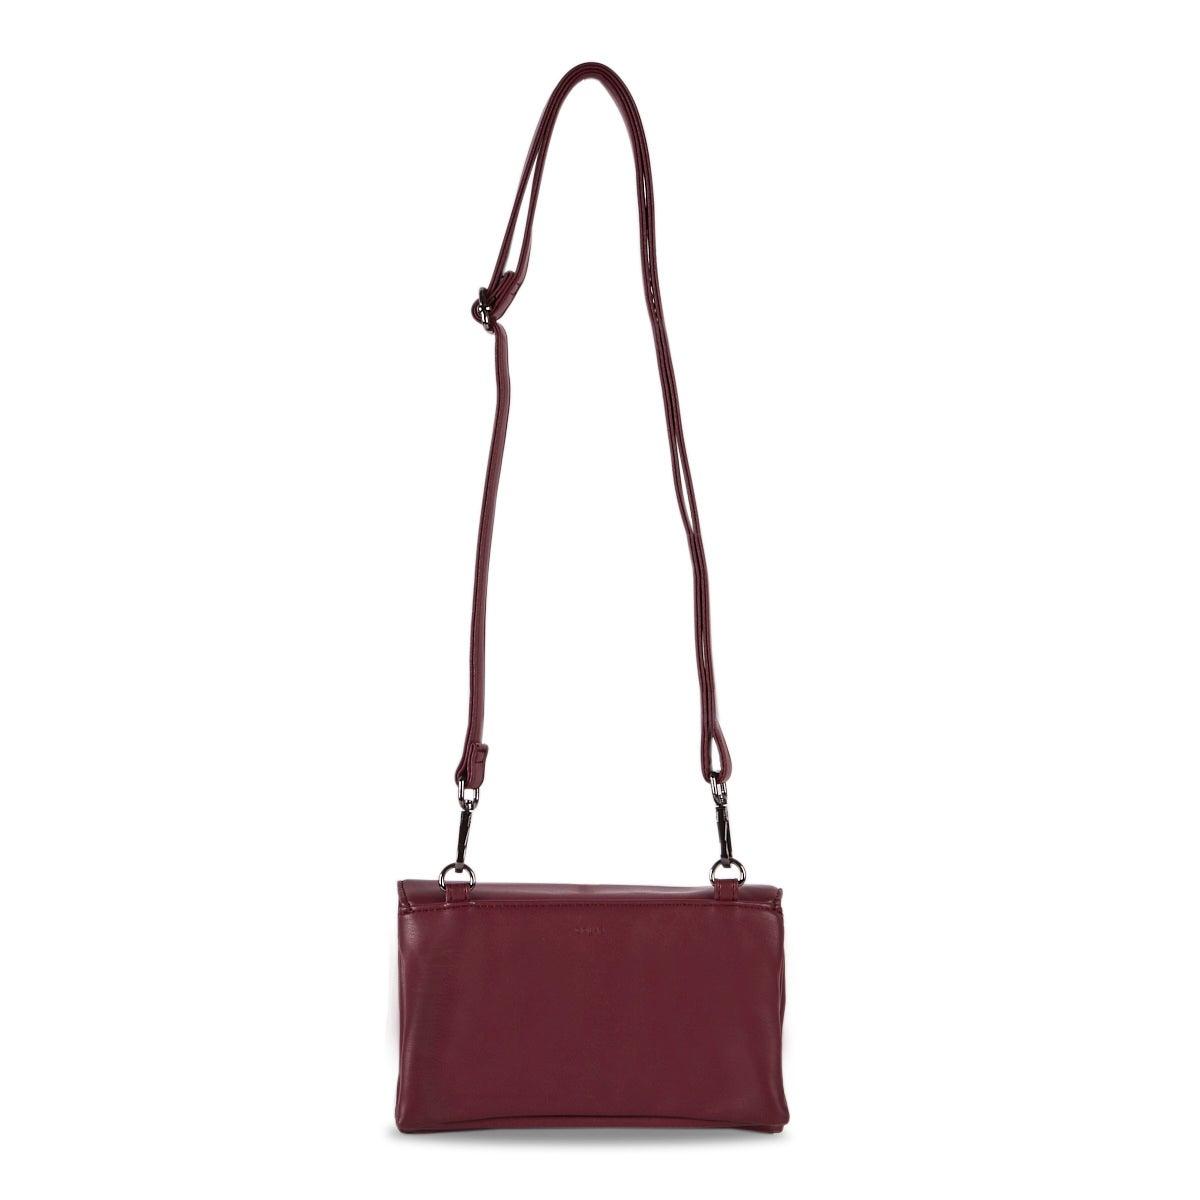 Lds Nappa Smalls berry crossbody bag